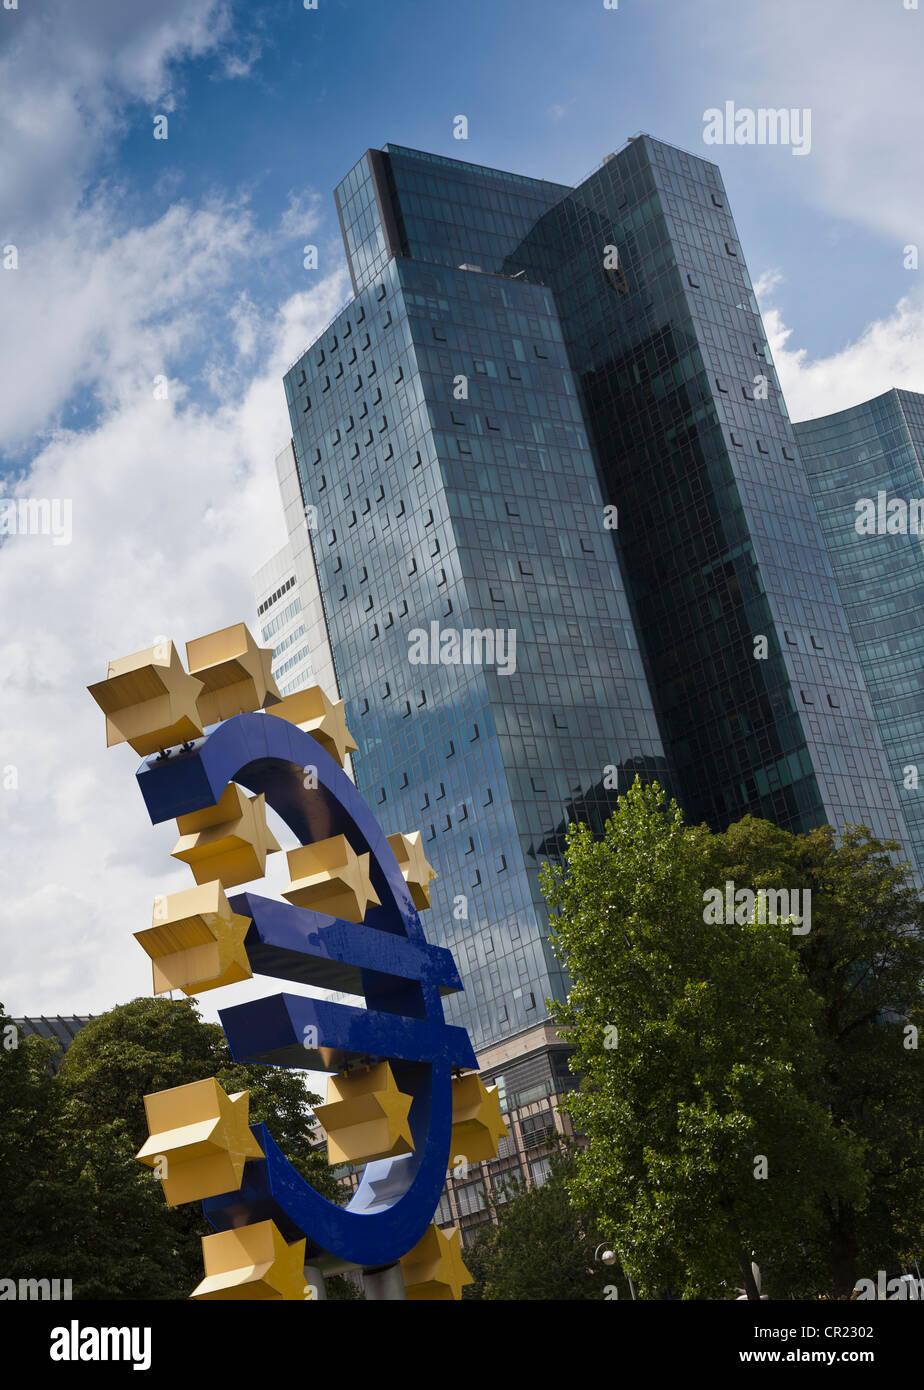 Sculpture of Euro symbol in city center - Stock Image